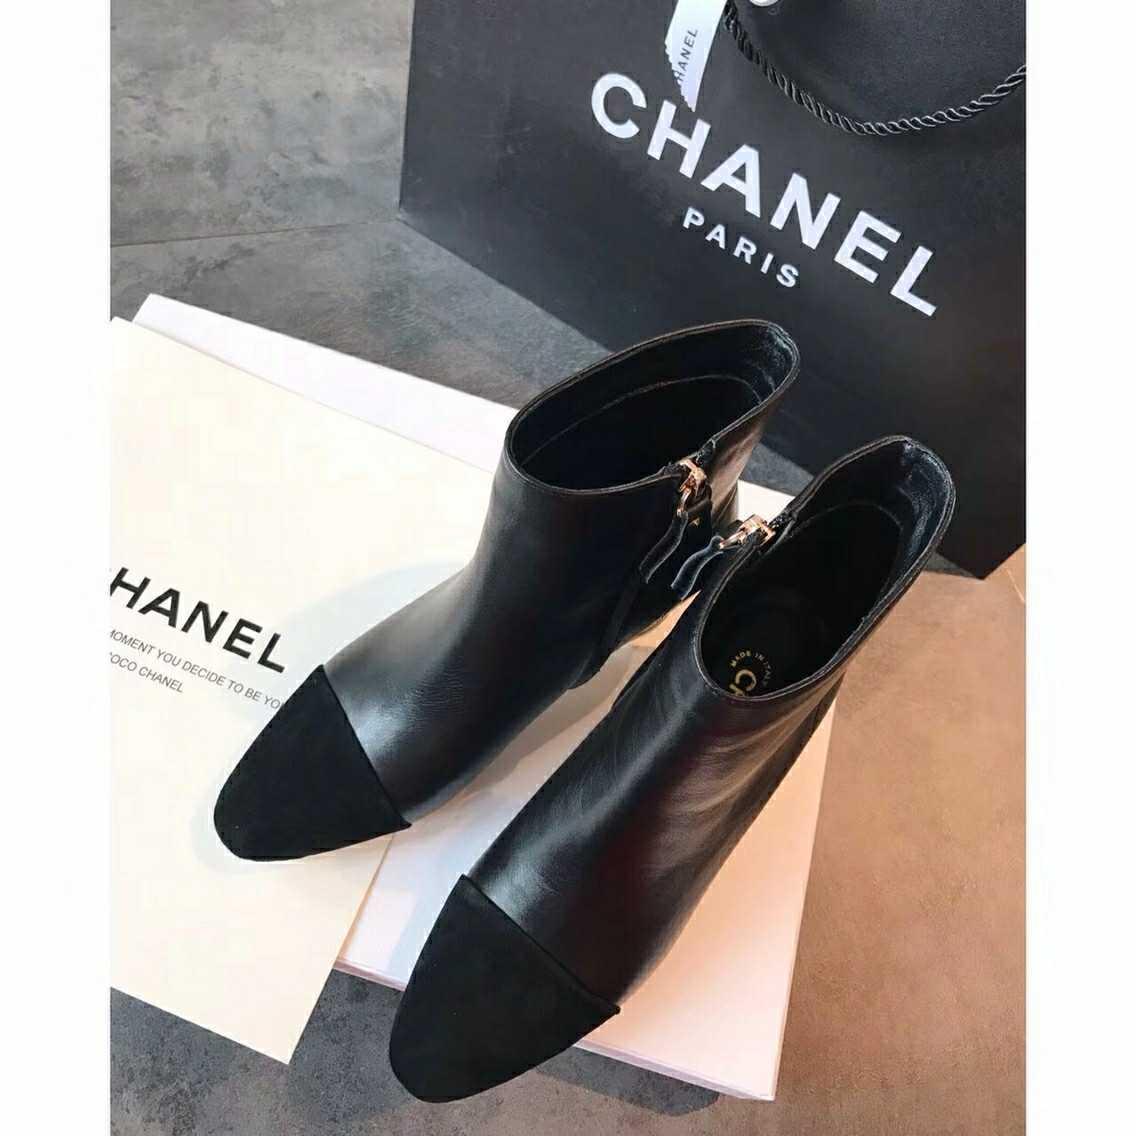 Chanel香奈儿秋冬款专柜同步上市